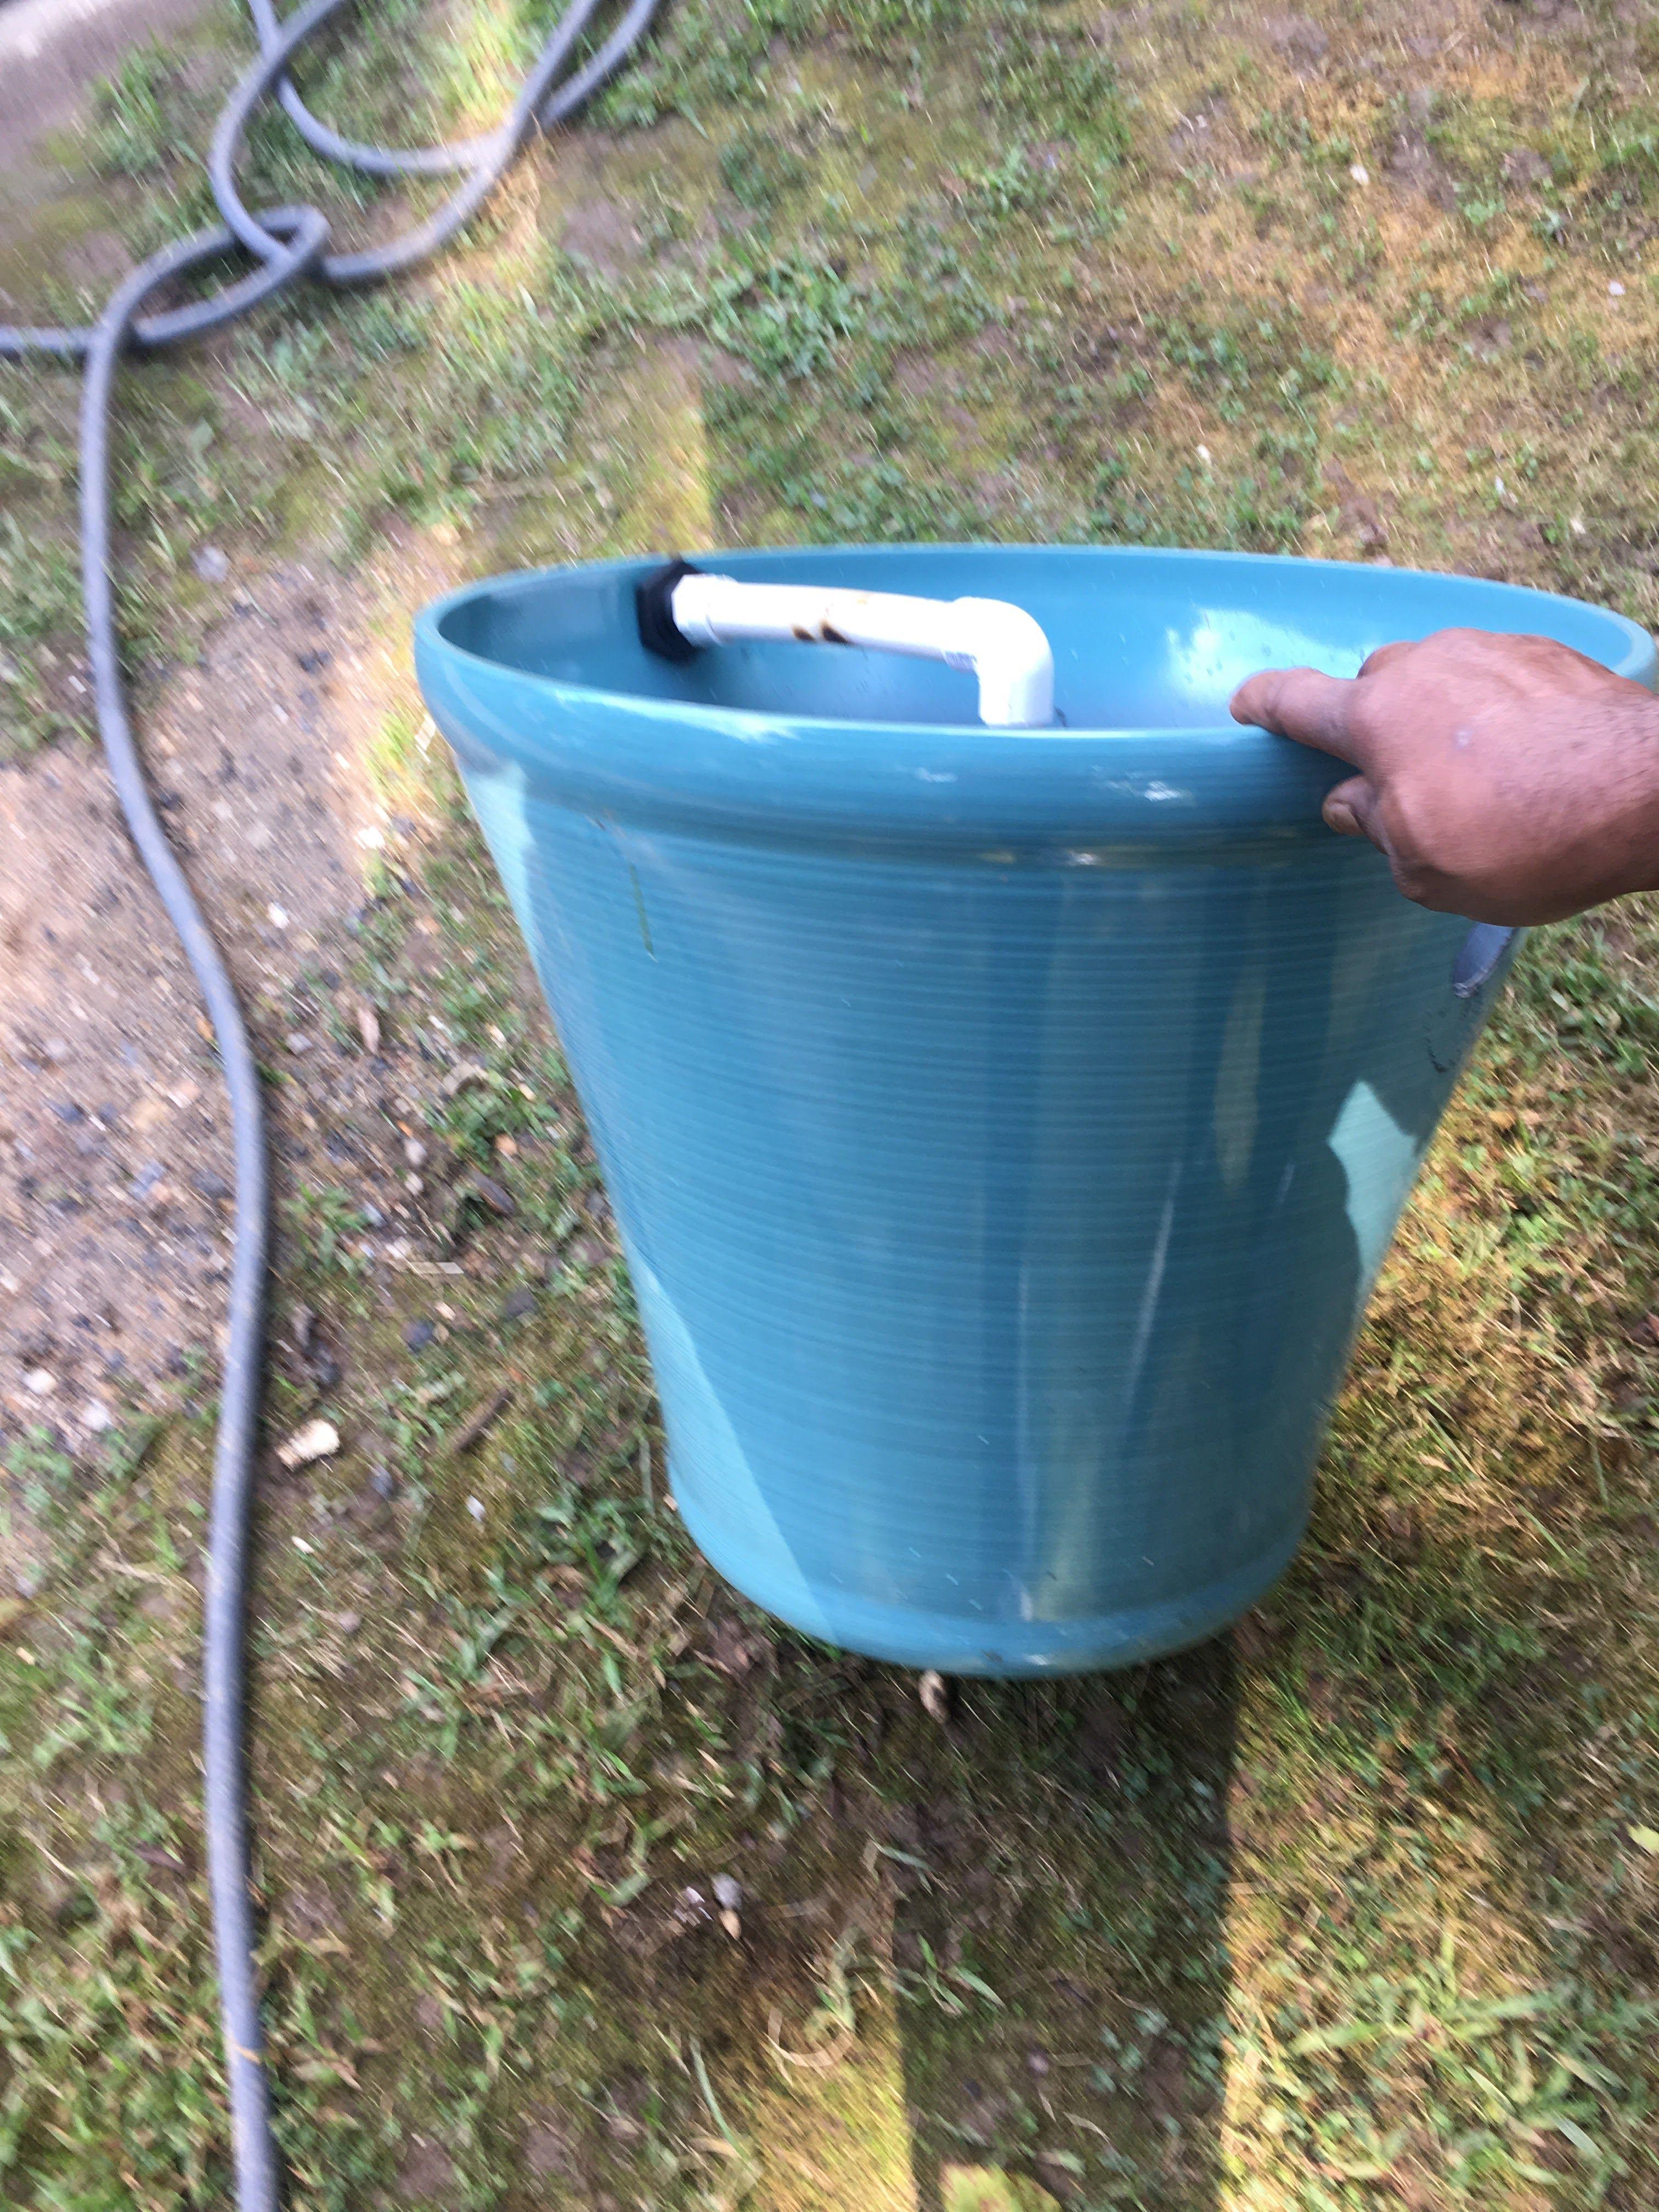 Diy bio filter ponds backyard diy backyard backyard